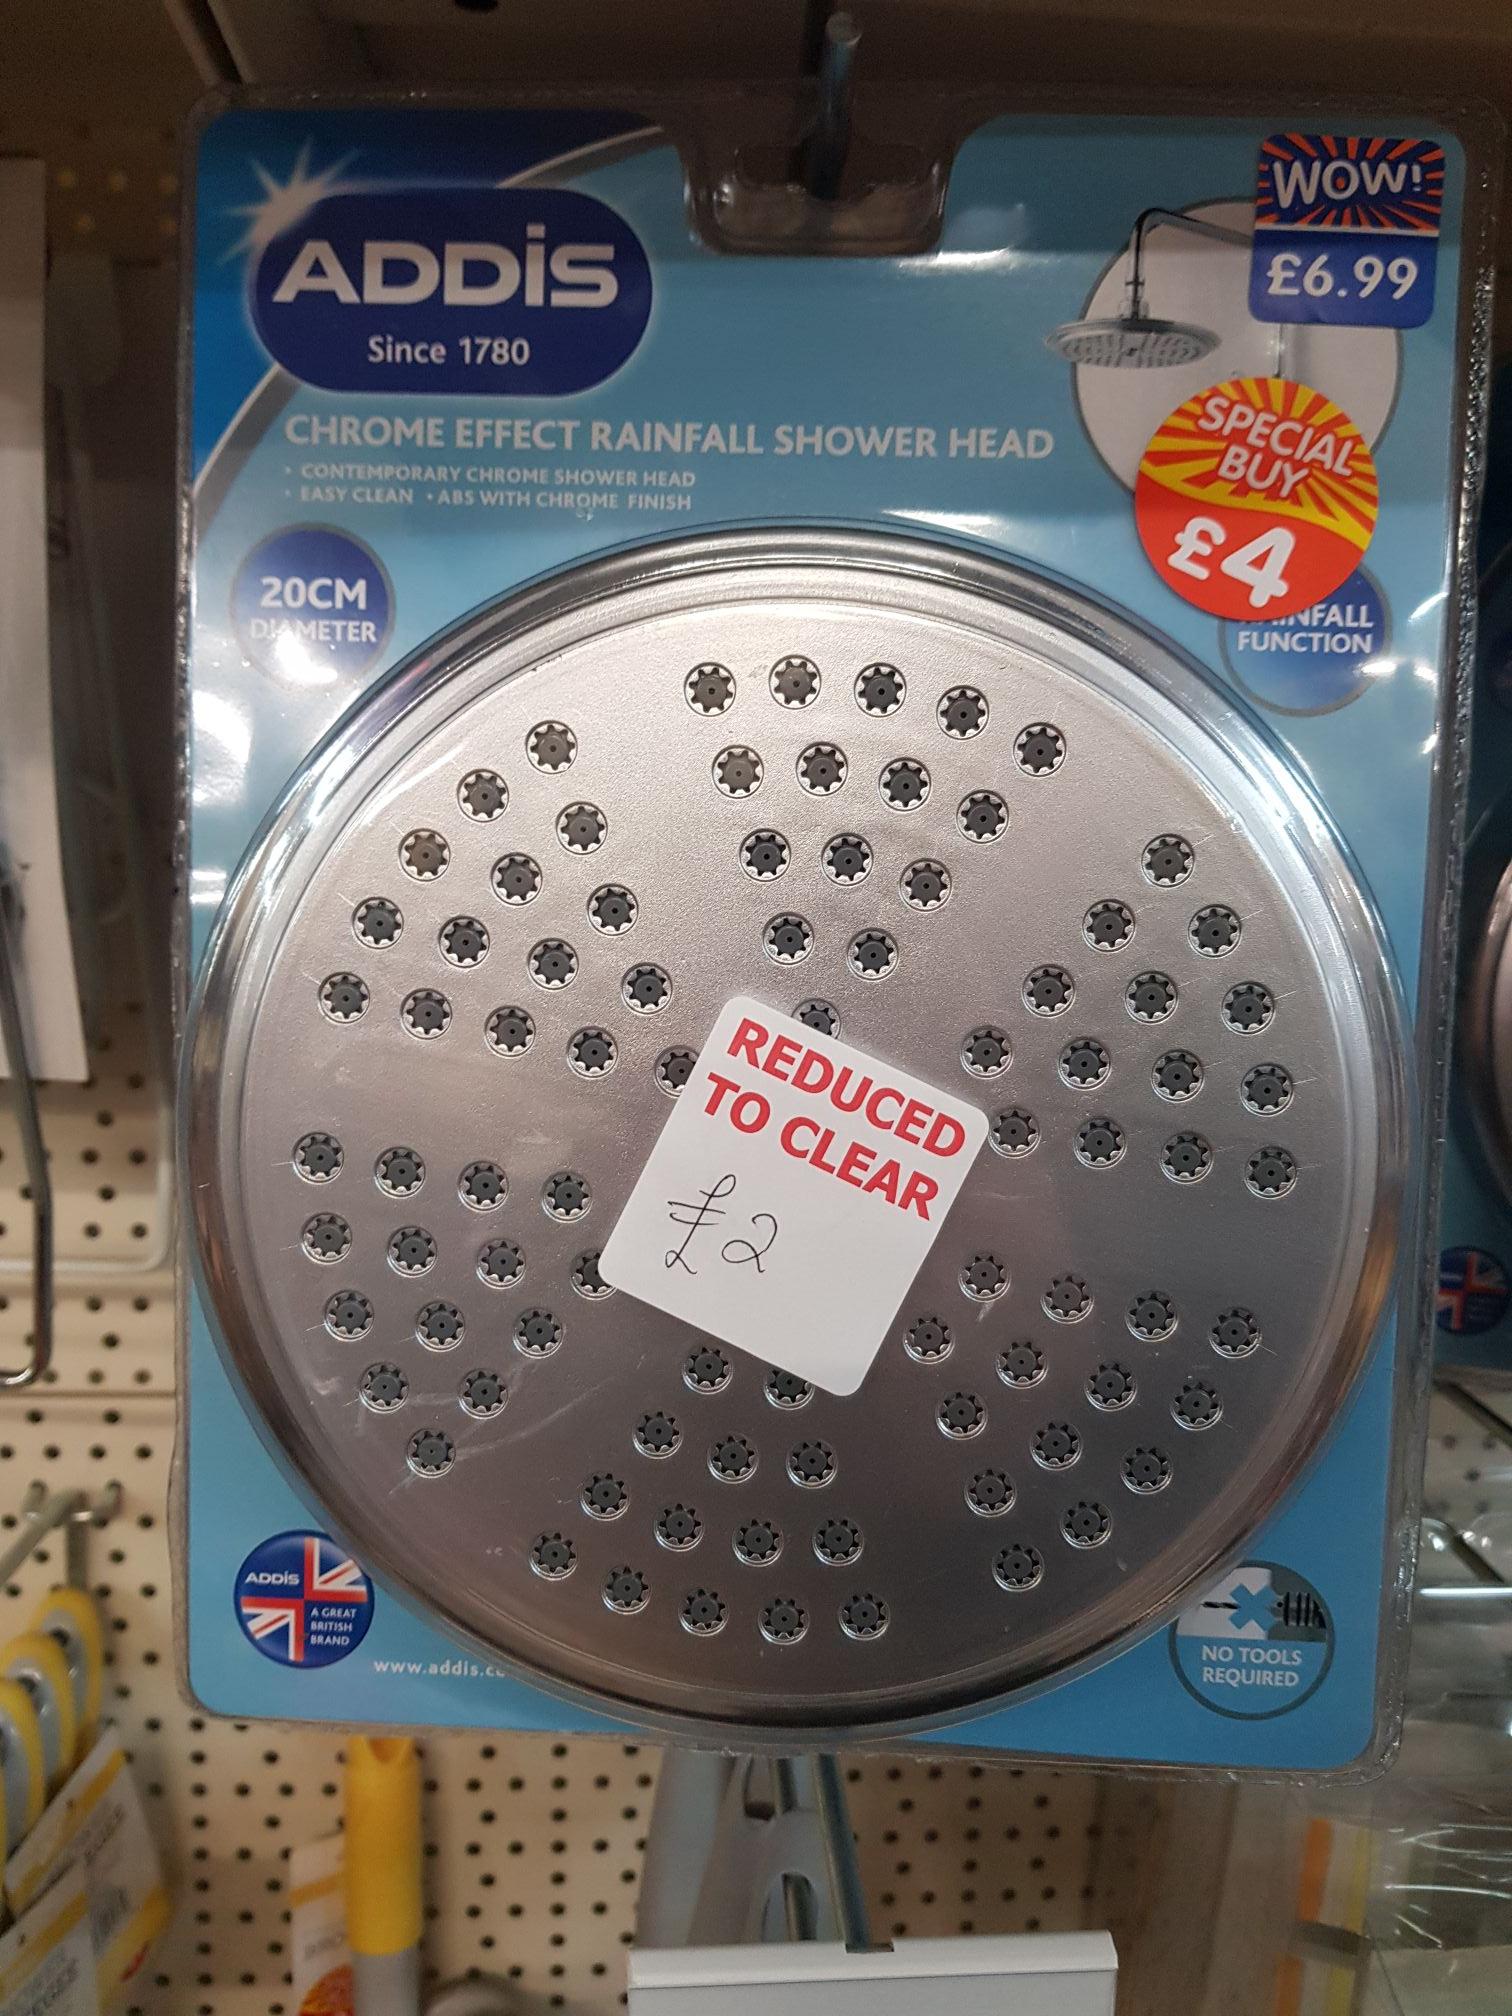 Addis 20cm shower head £2 @ B&M Flint (wales)